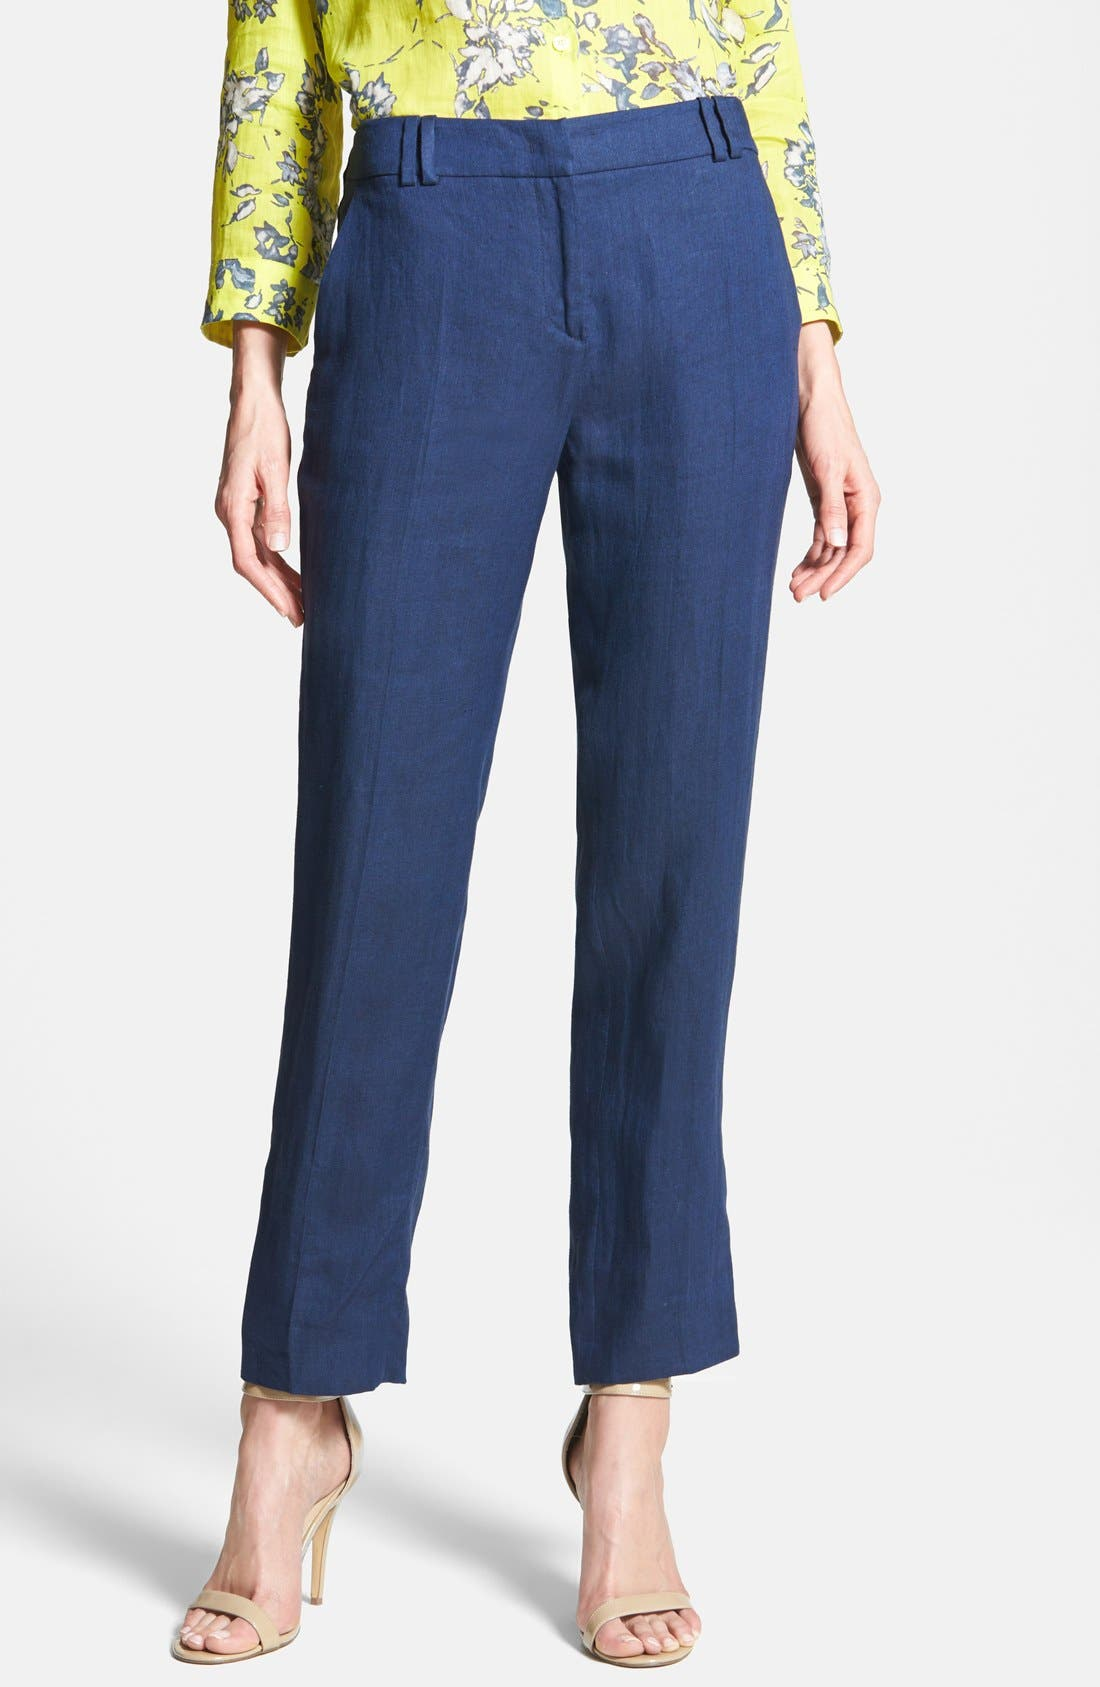 Alternate Image 1 Selected - Weekend Max Mara Linen Ankle Pants